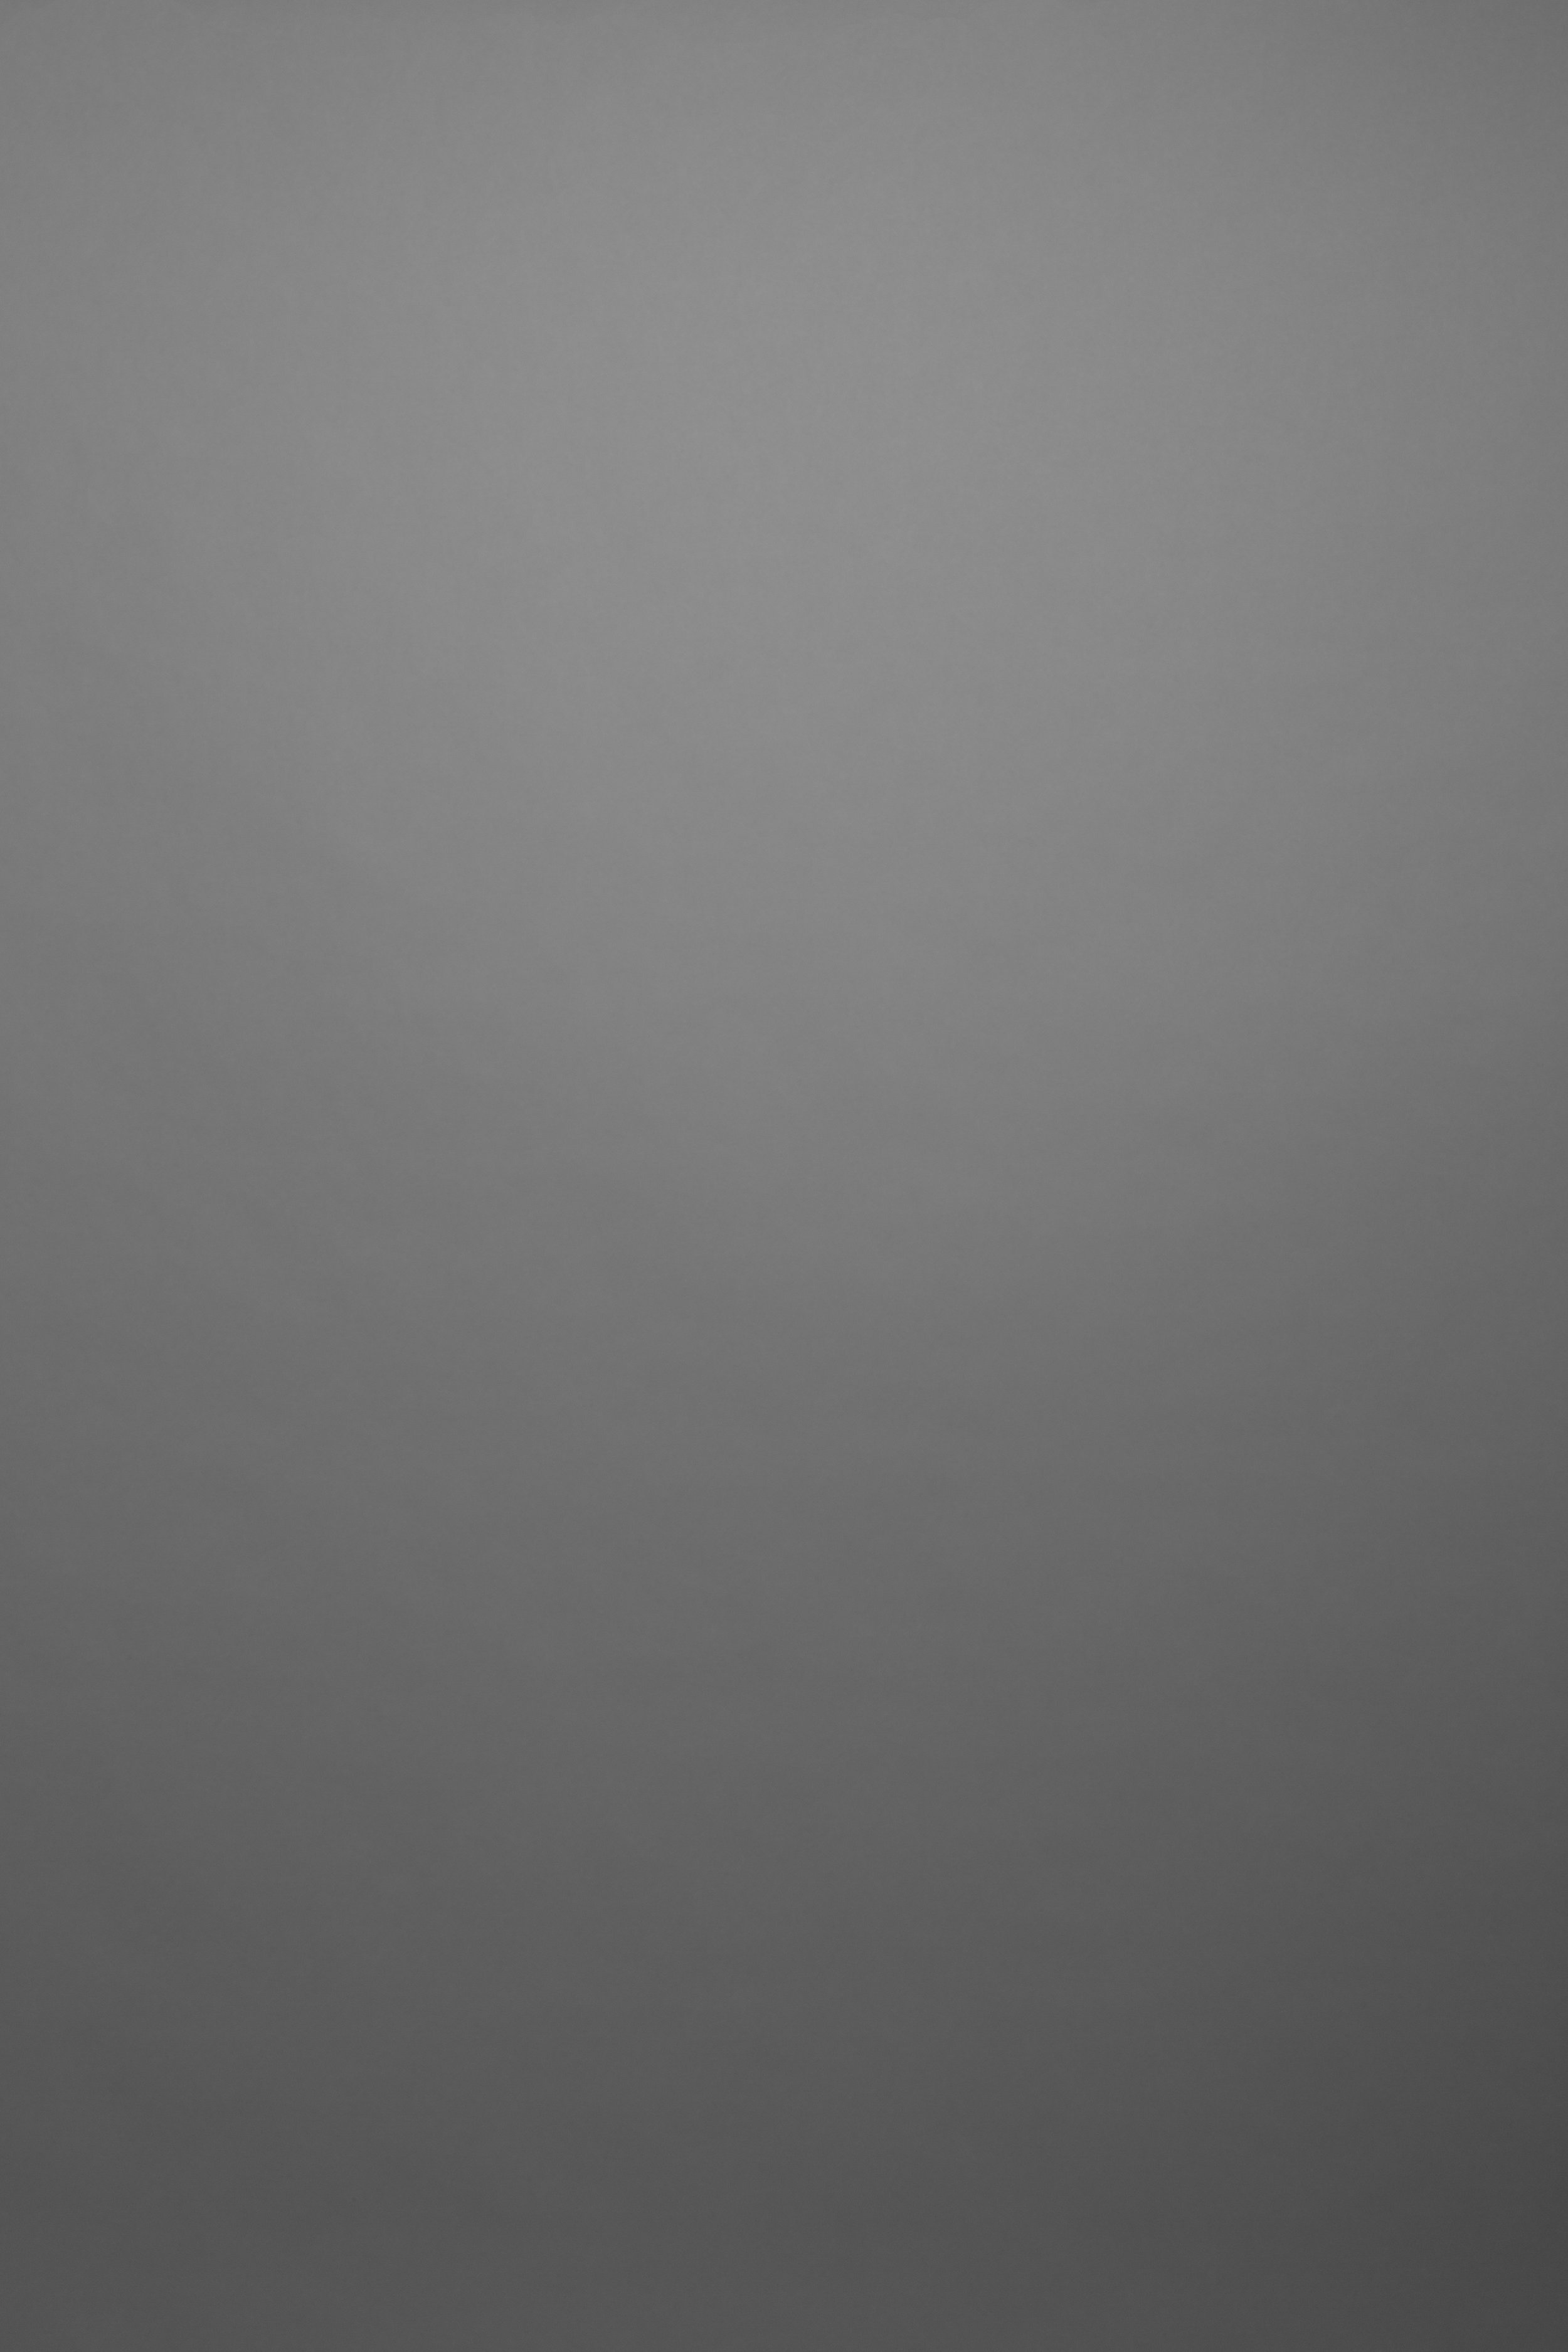 Dark Grey Three Quarters Background